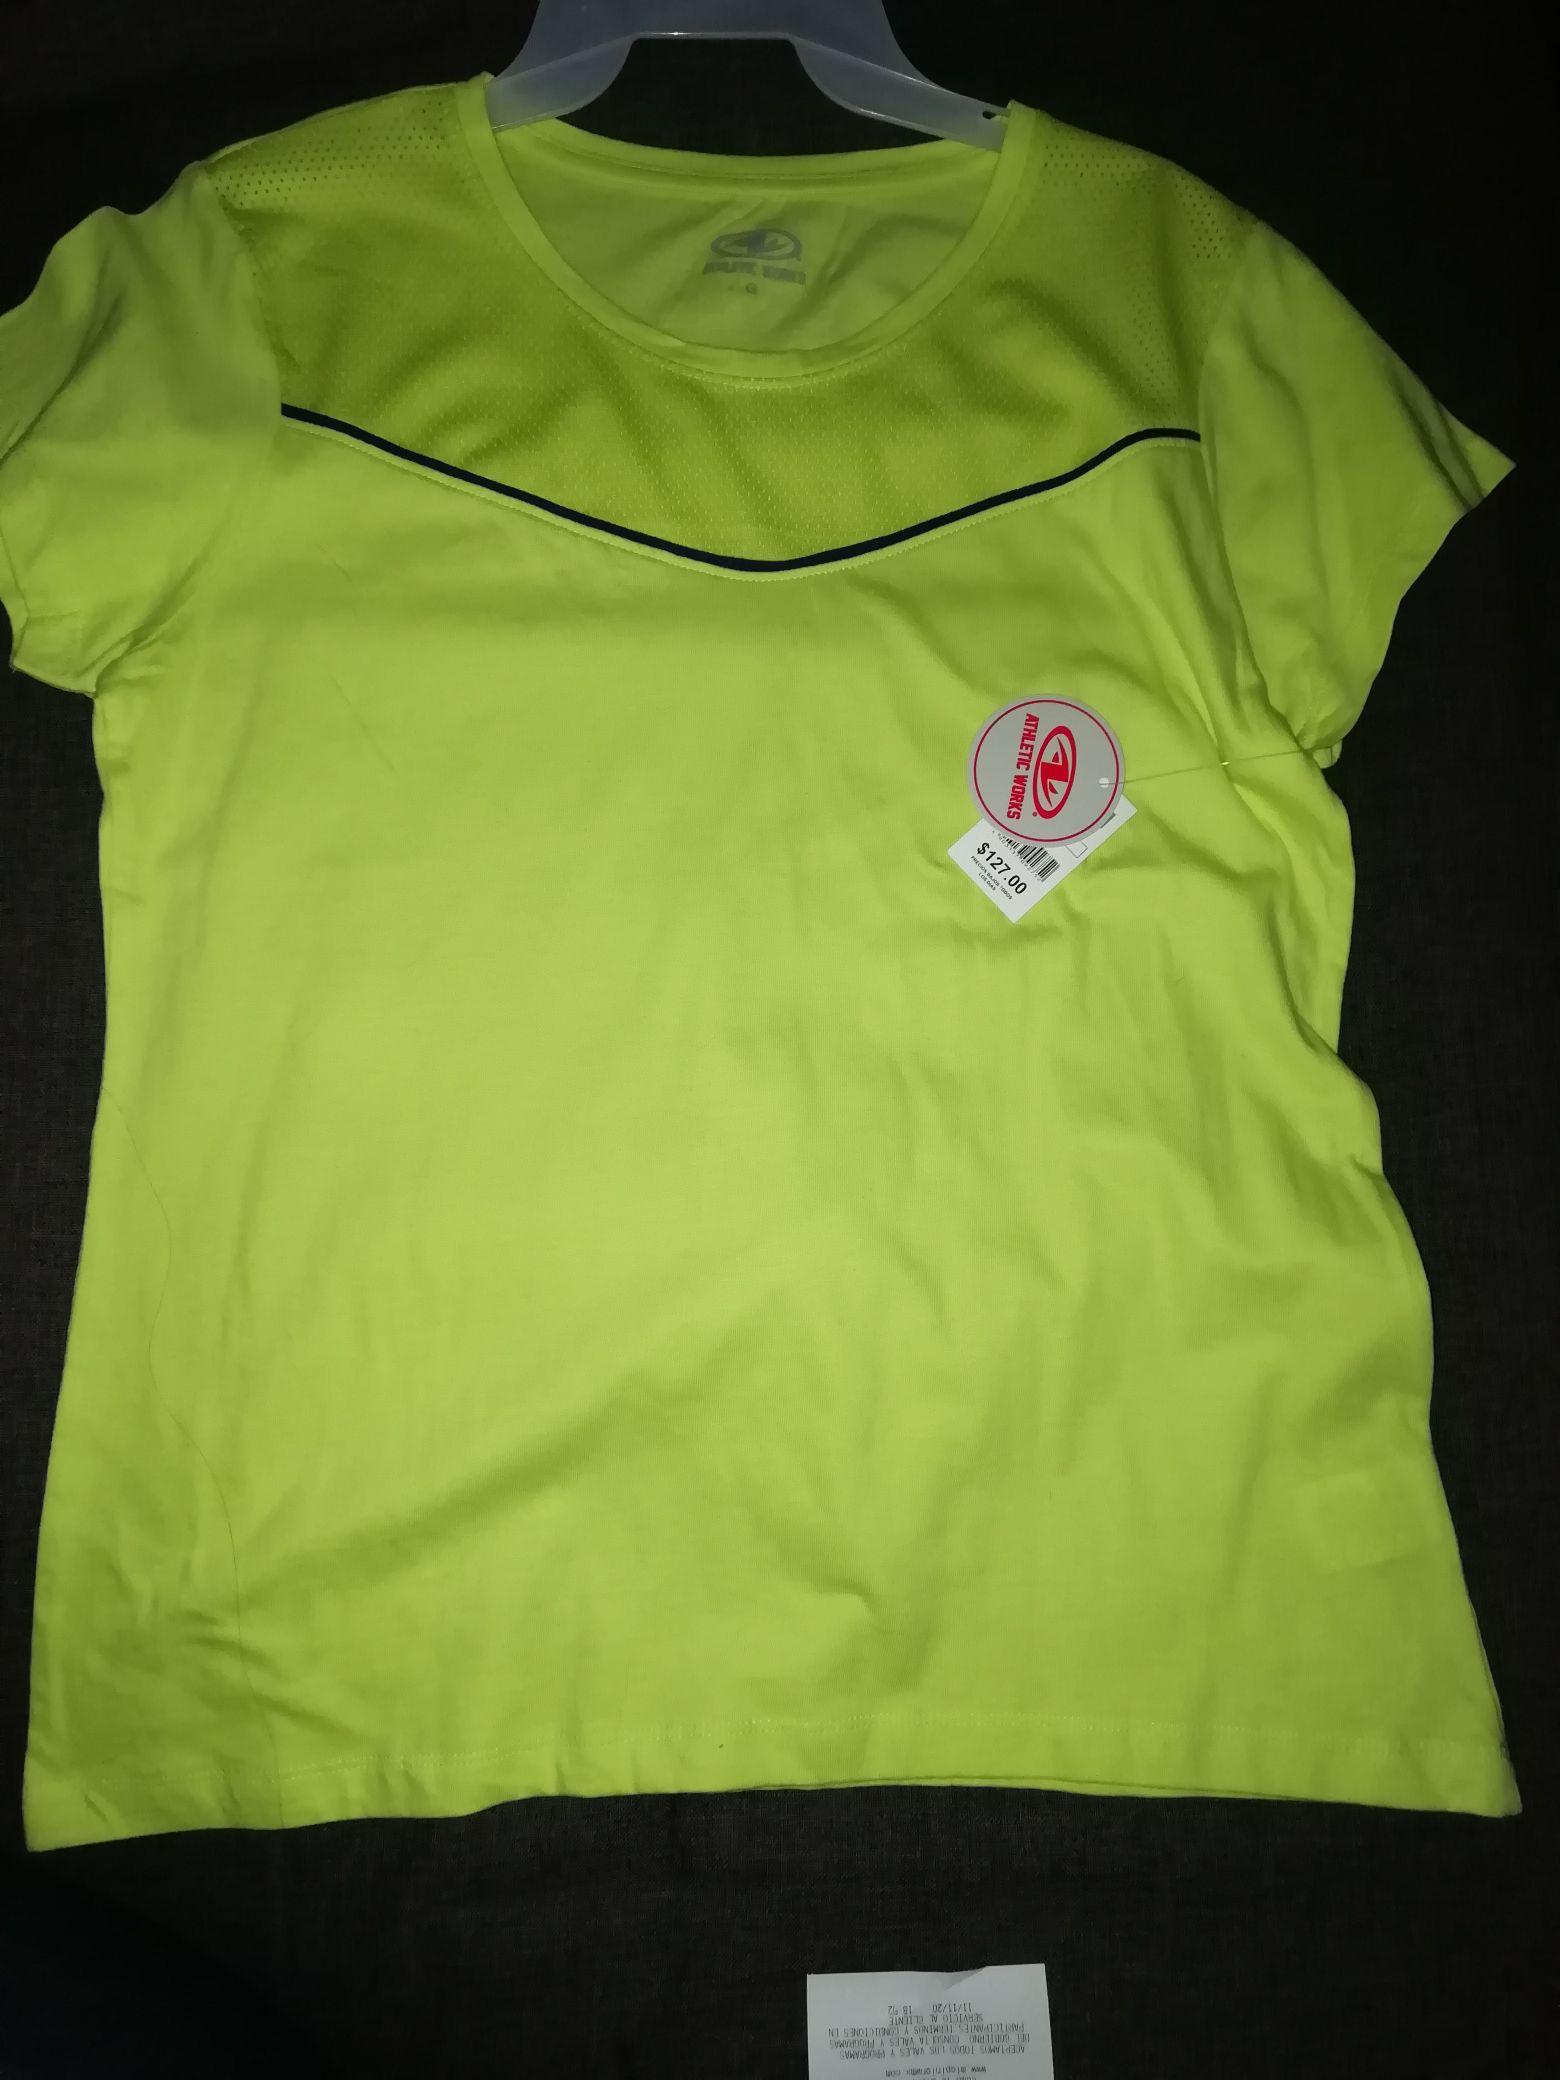 Bodega Aurrera: playera deportiva para dama.